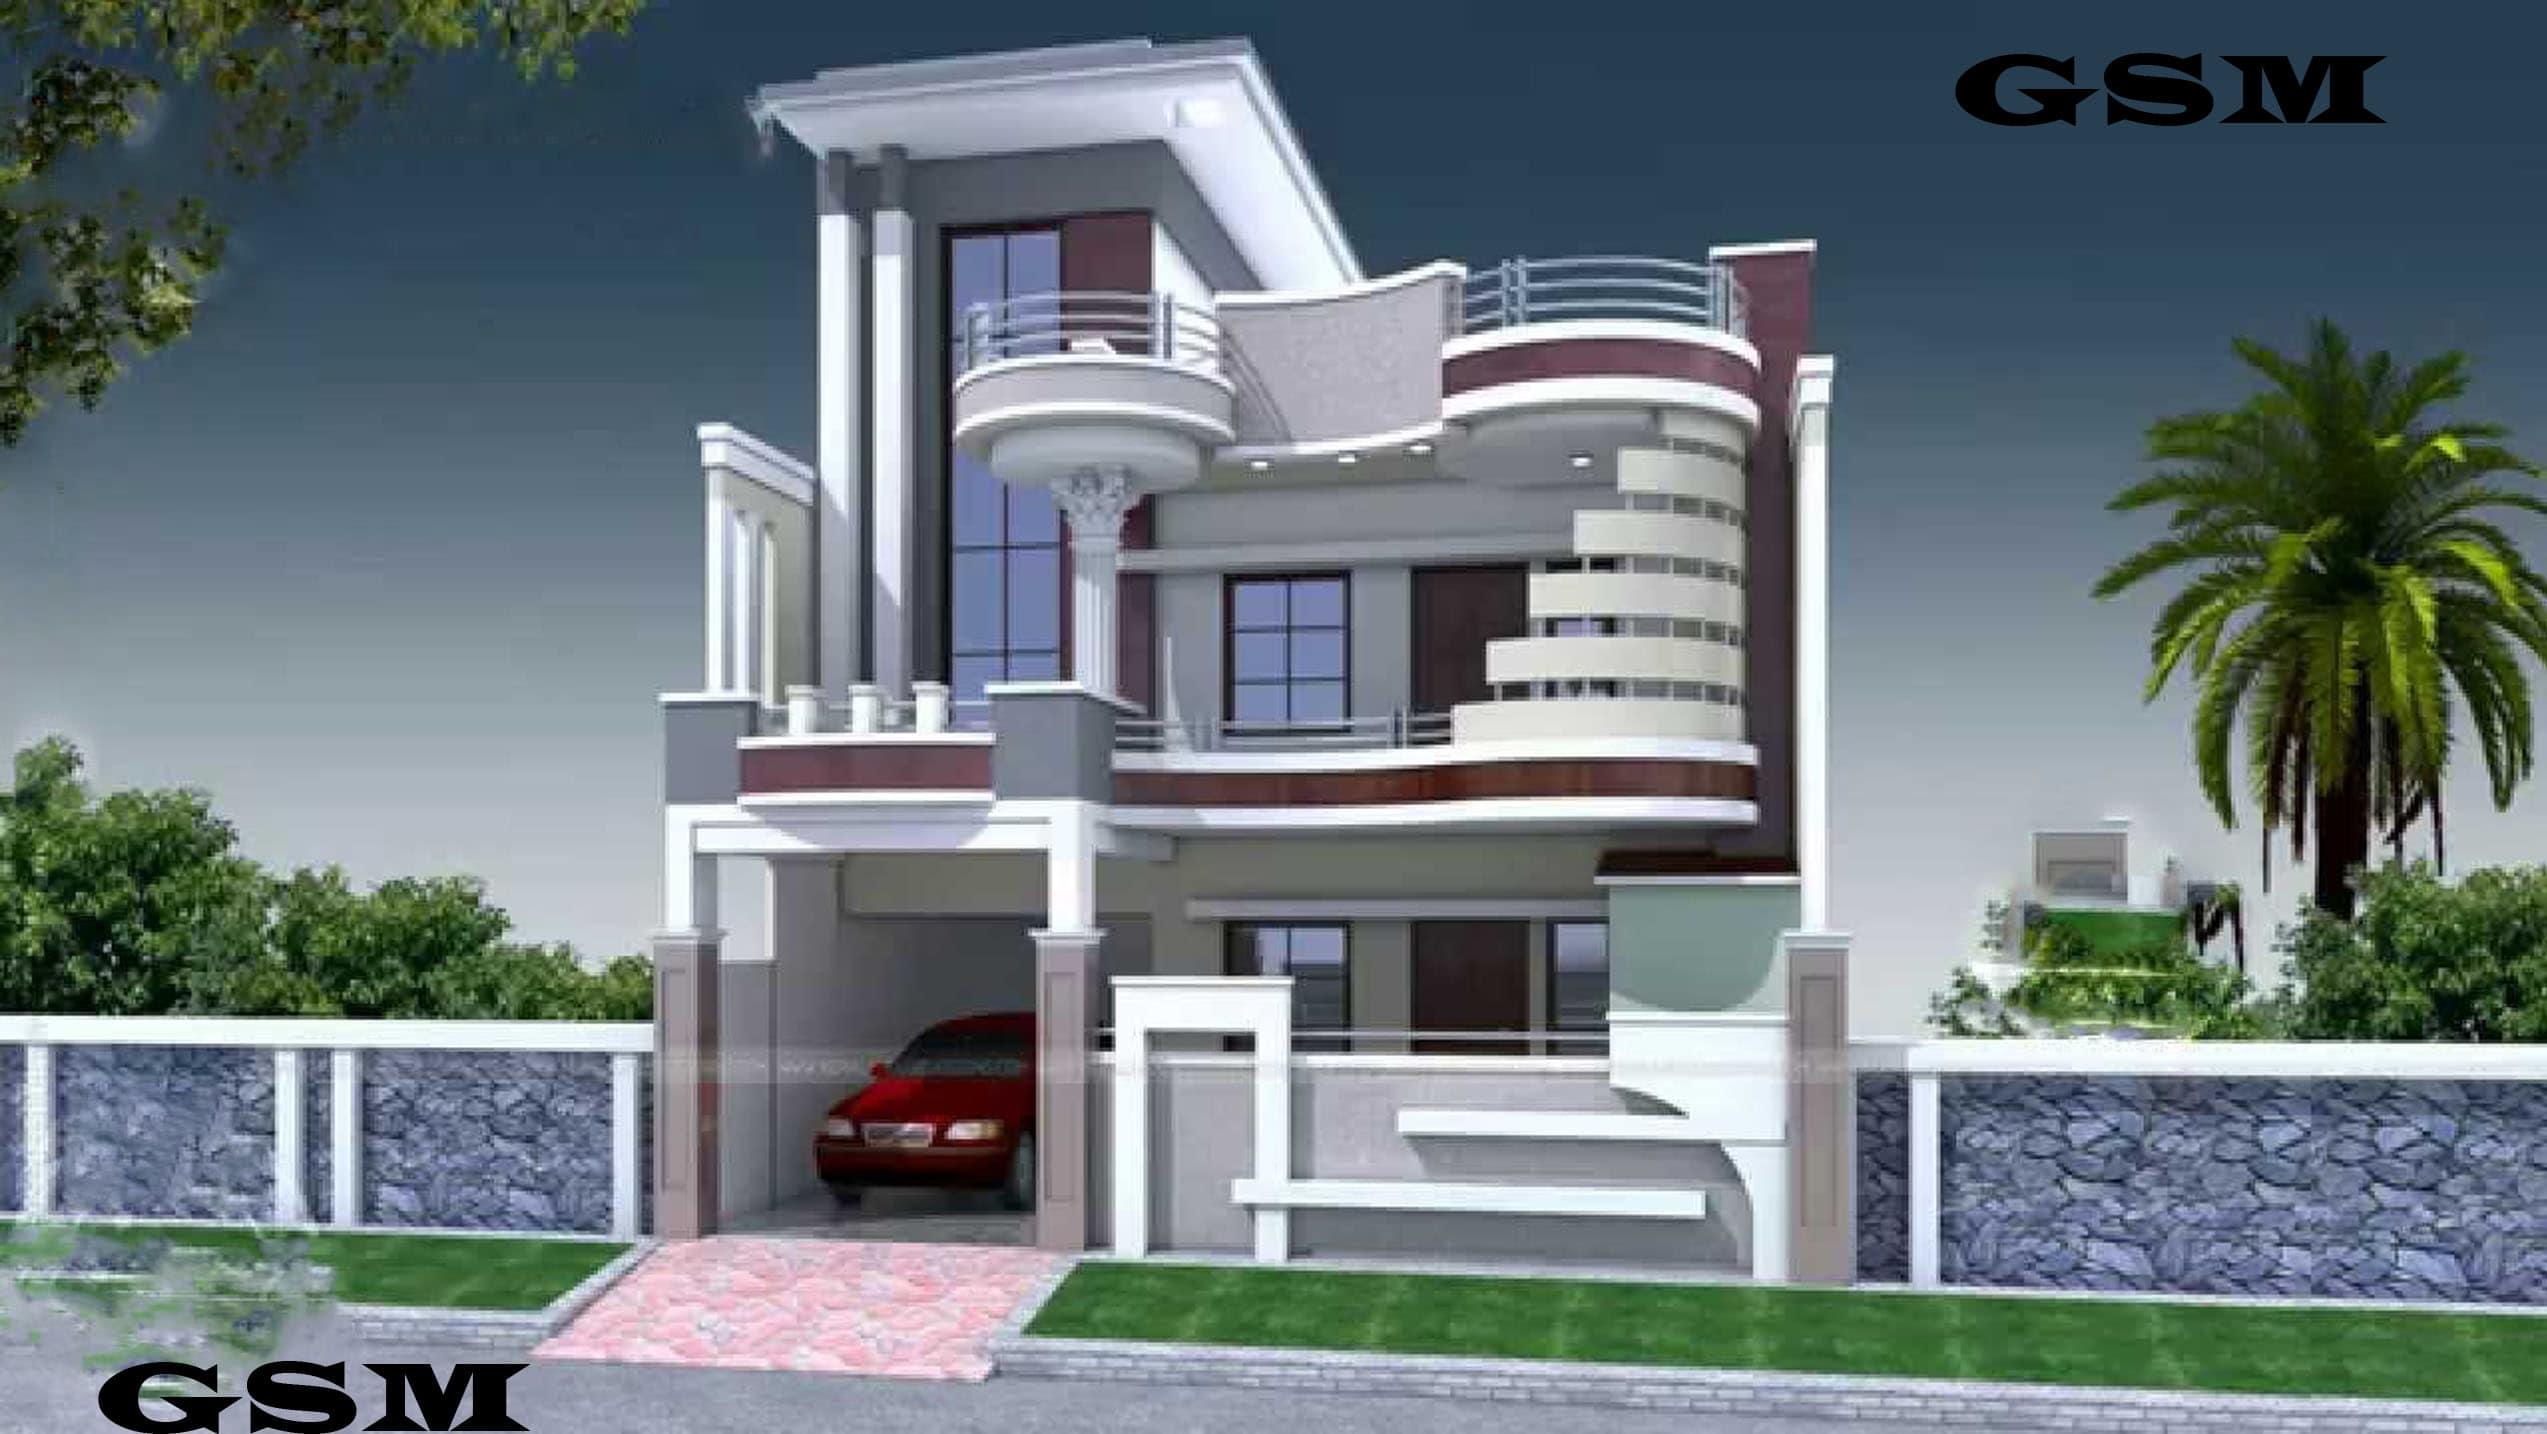 3d Modal Building Complete Design Home Building Projects Front Design By Muhammedsajed